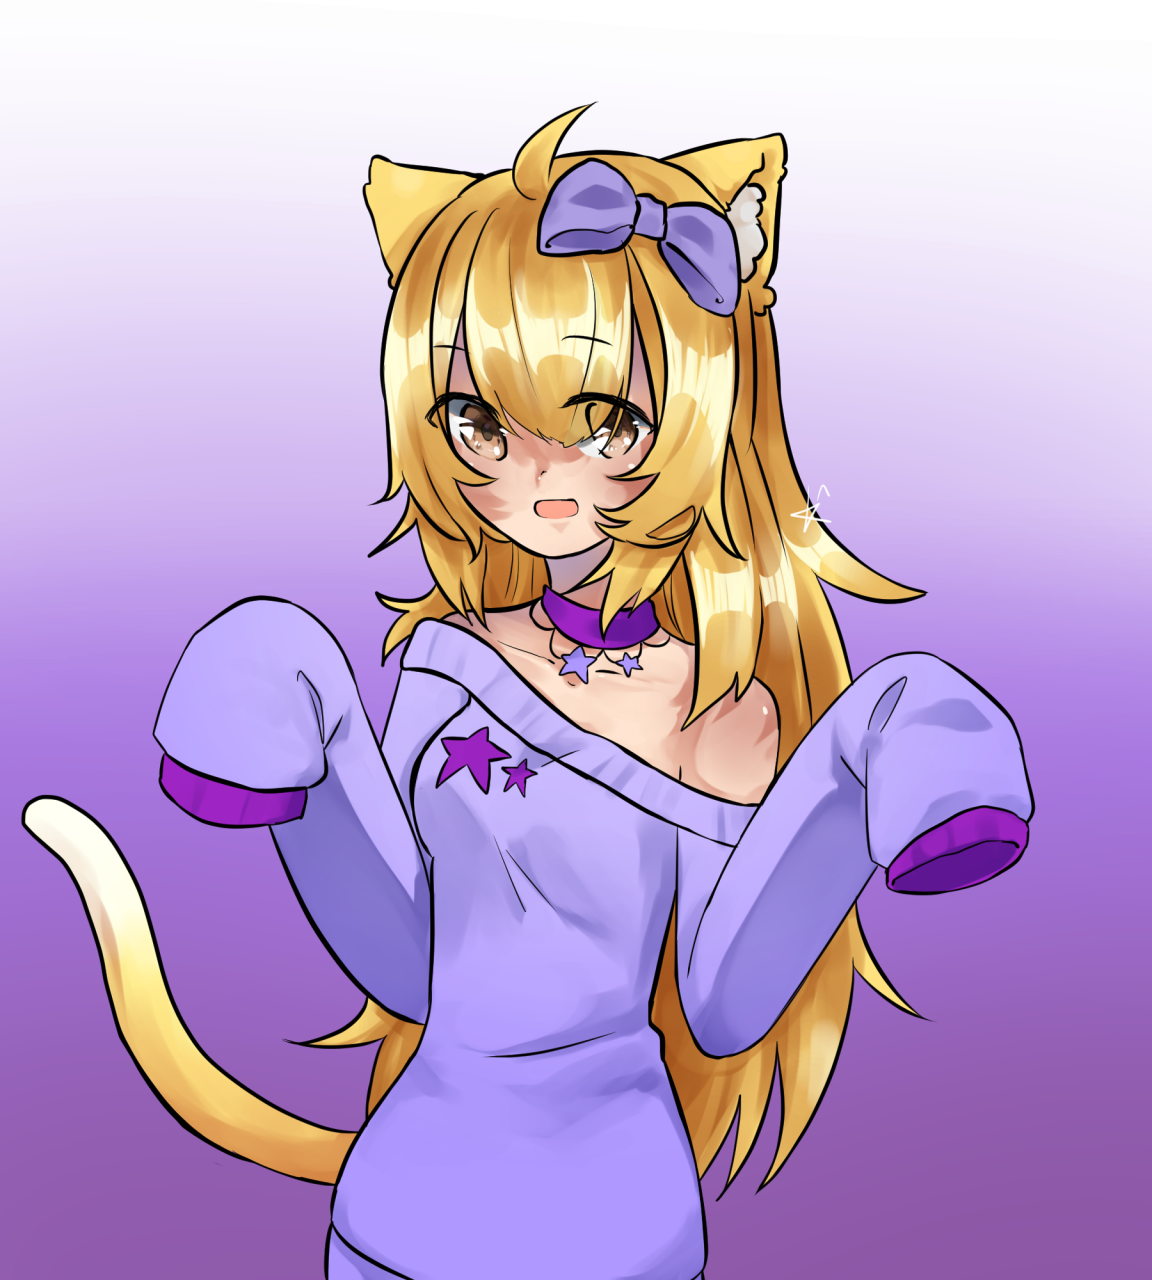 AlexisNobuyuki [Request]